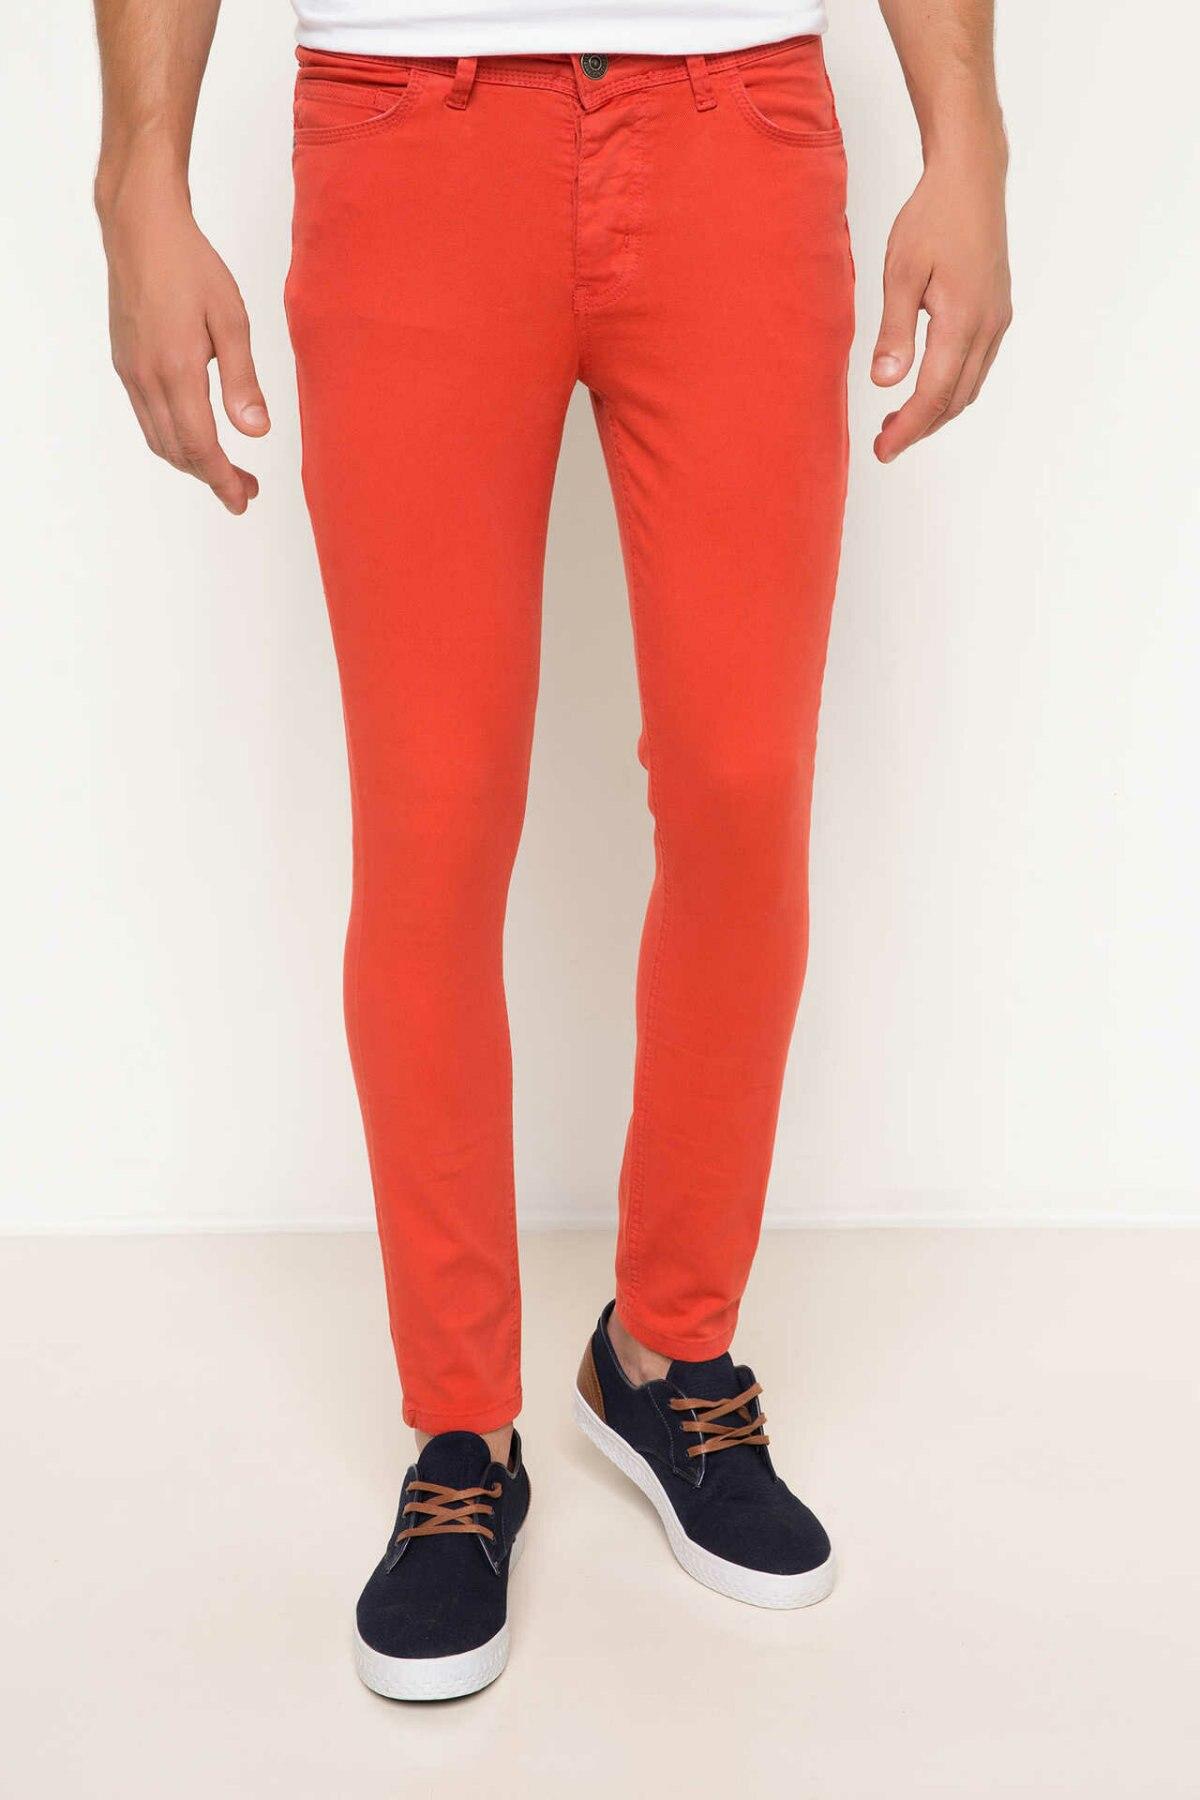 DeFacto Man Fashion Skinny Trousers Male Bright Color Casual High Quality Leisure Long Pants For Men's Autumn - H8636AZ17HS